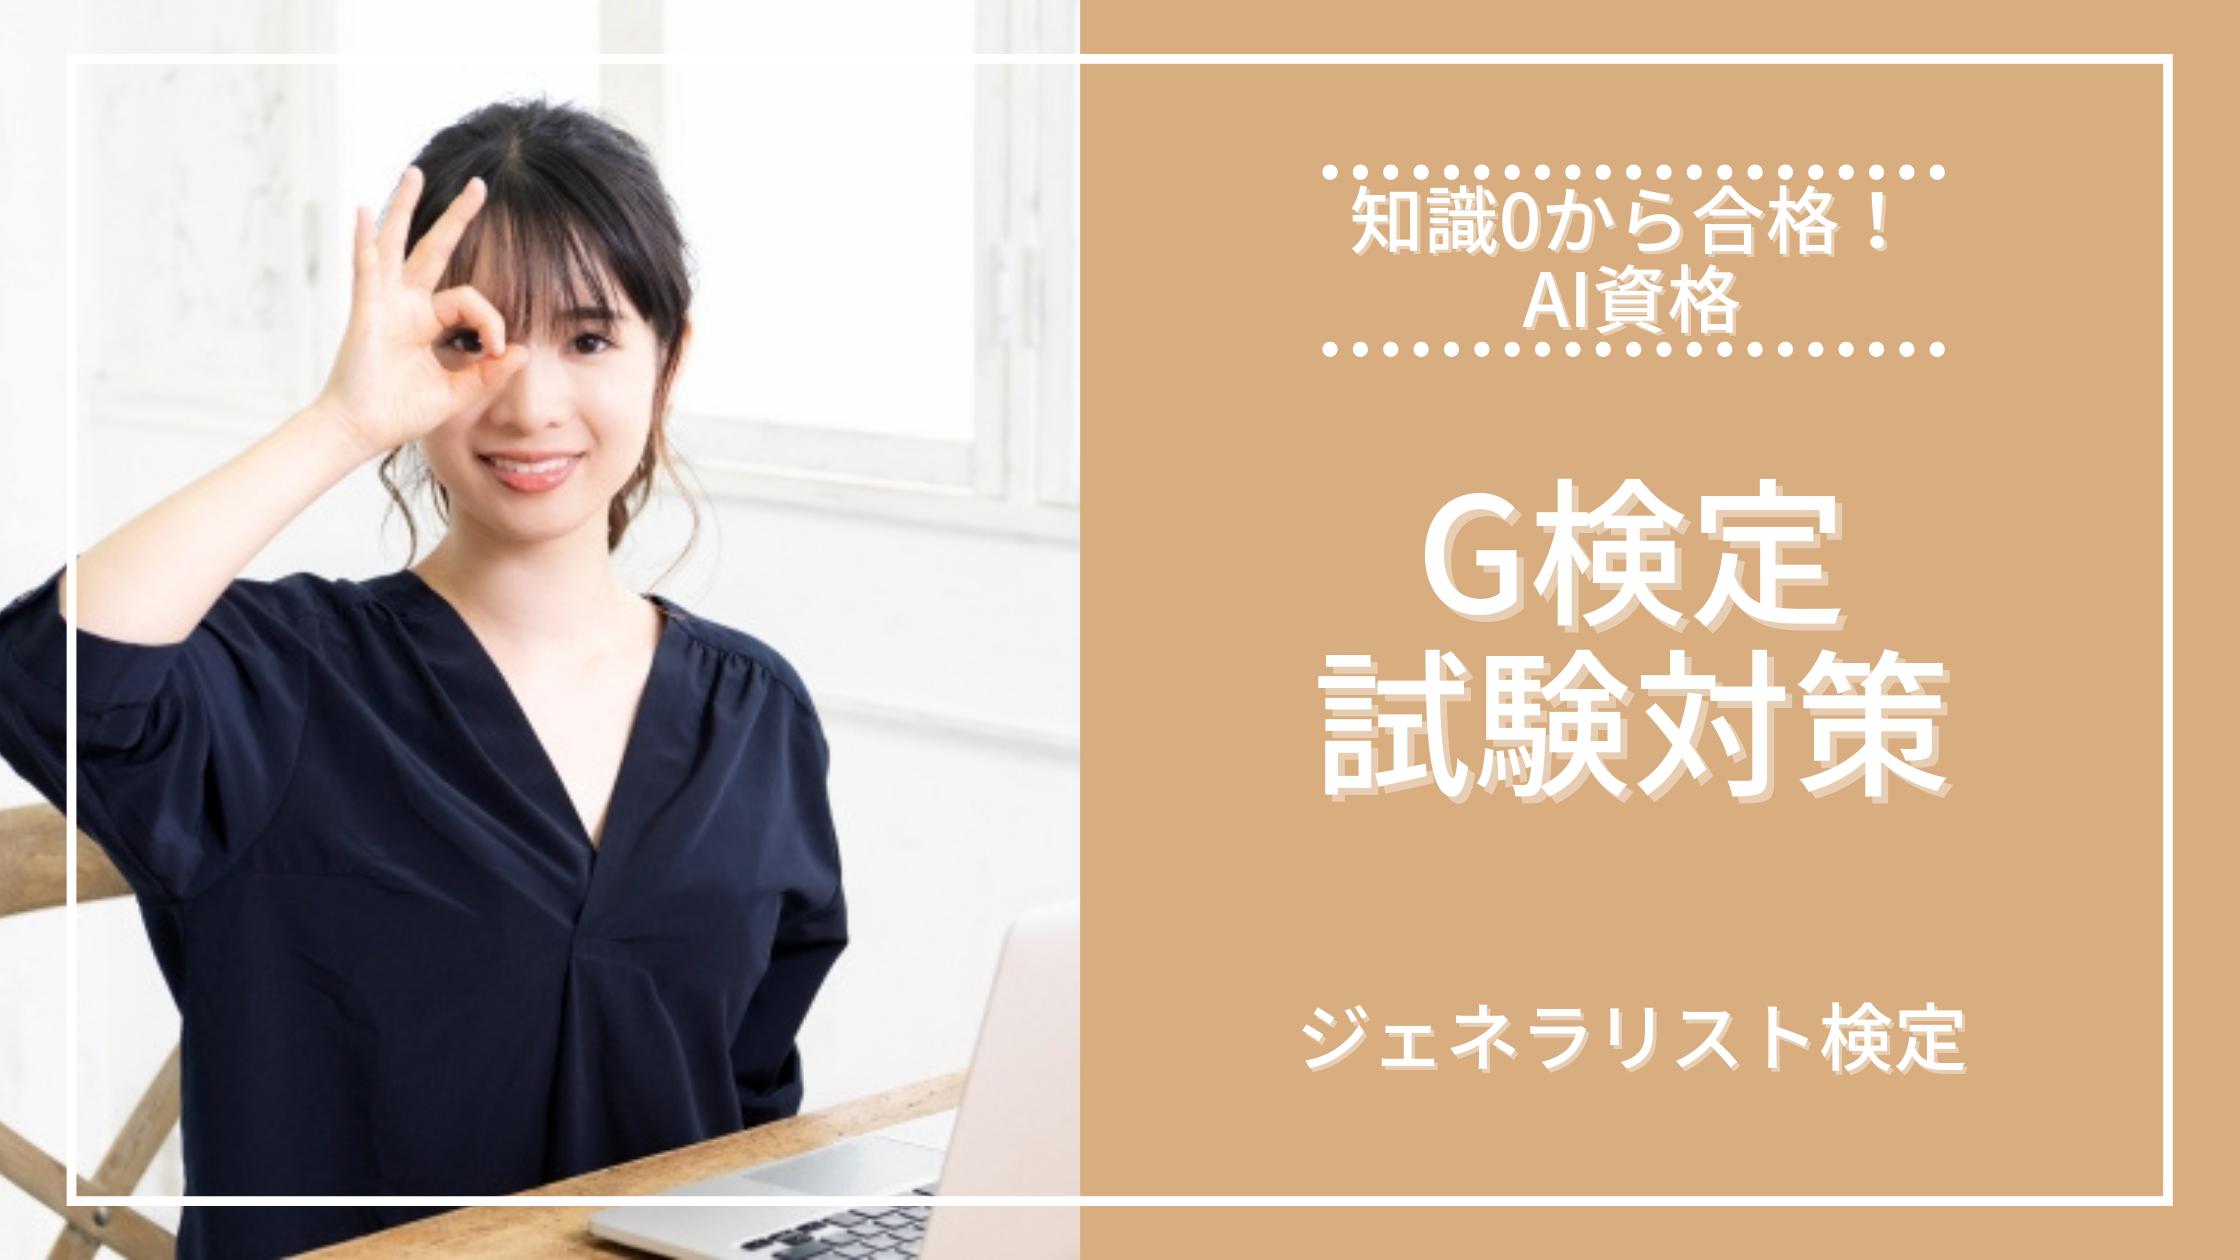 G検定試験対策